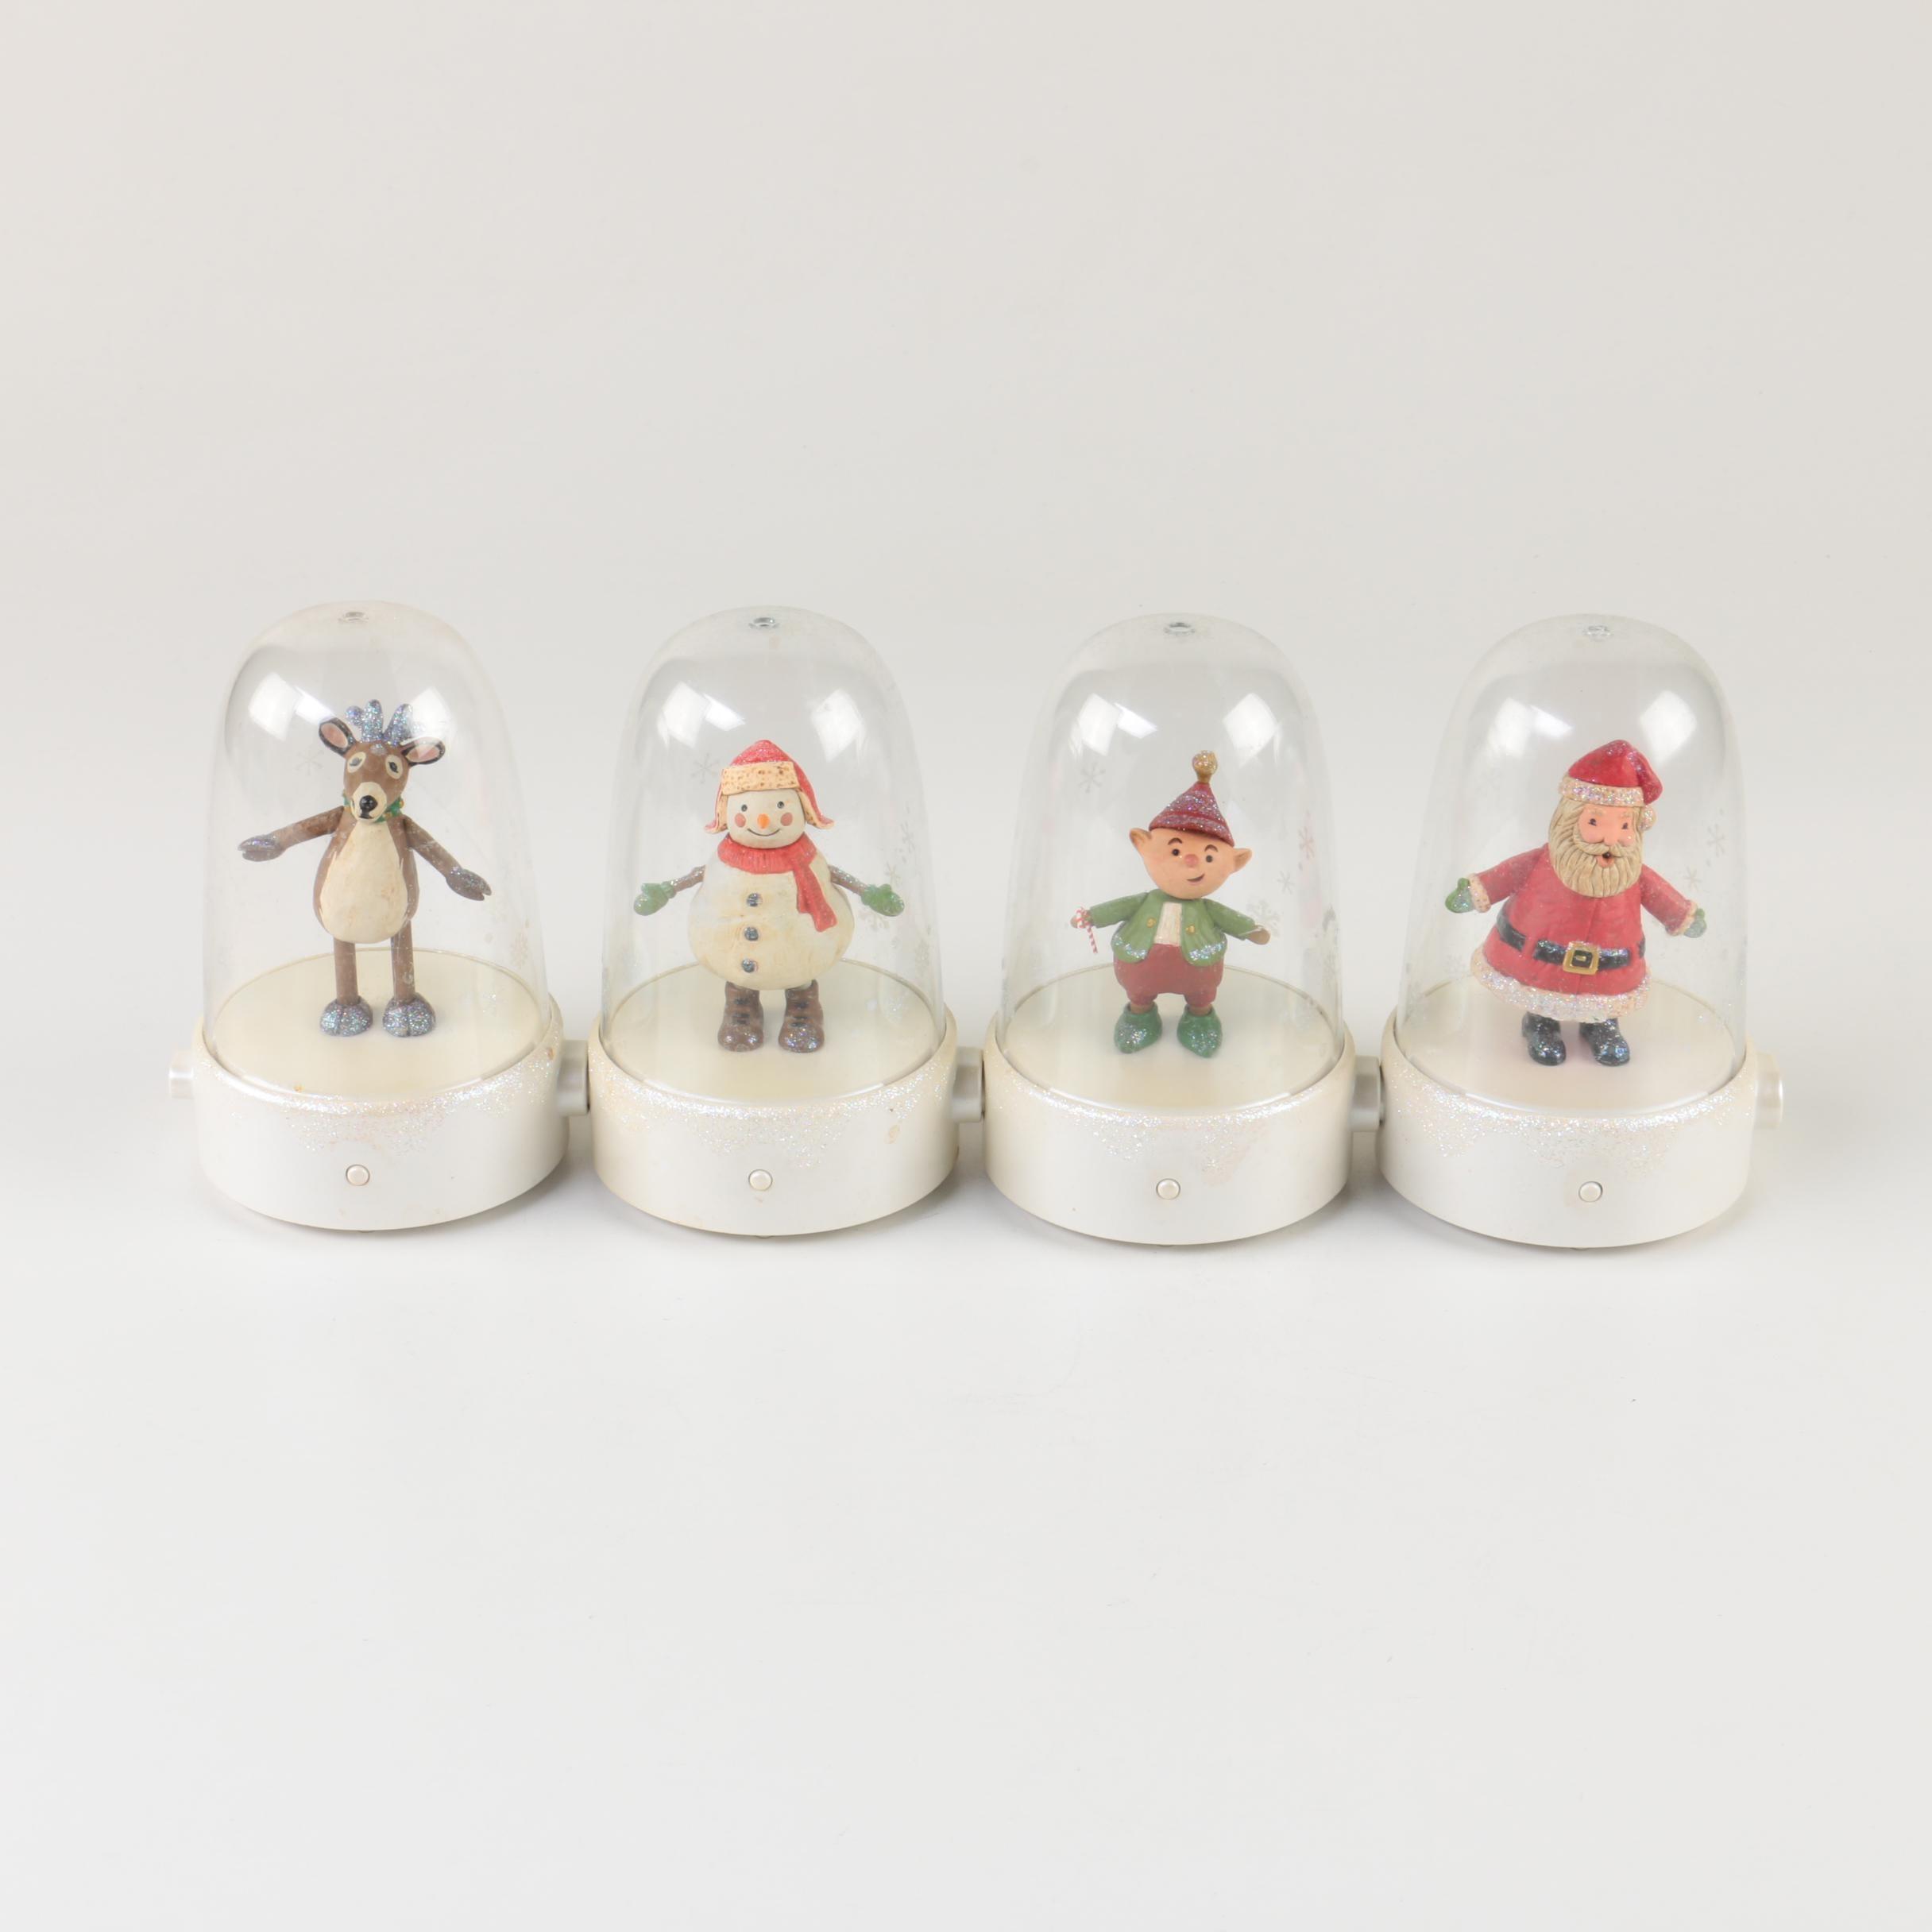 Hallmark Brand Snow Globe Figurines